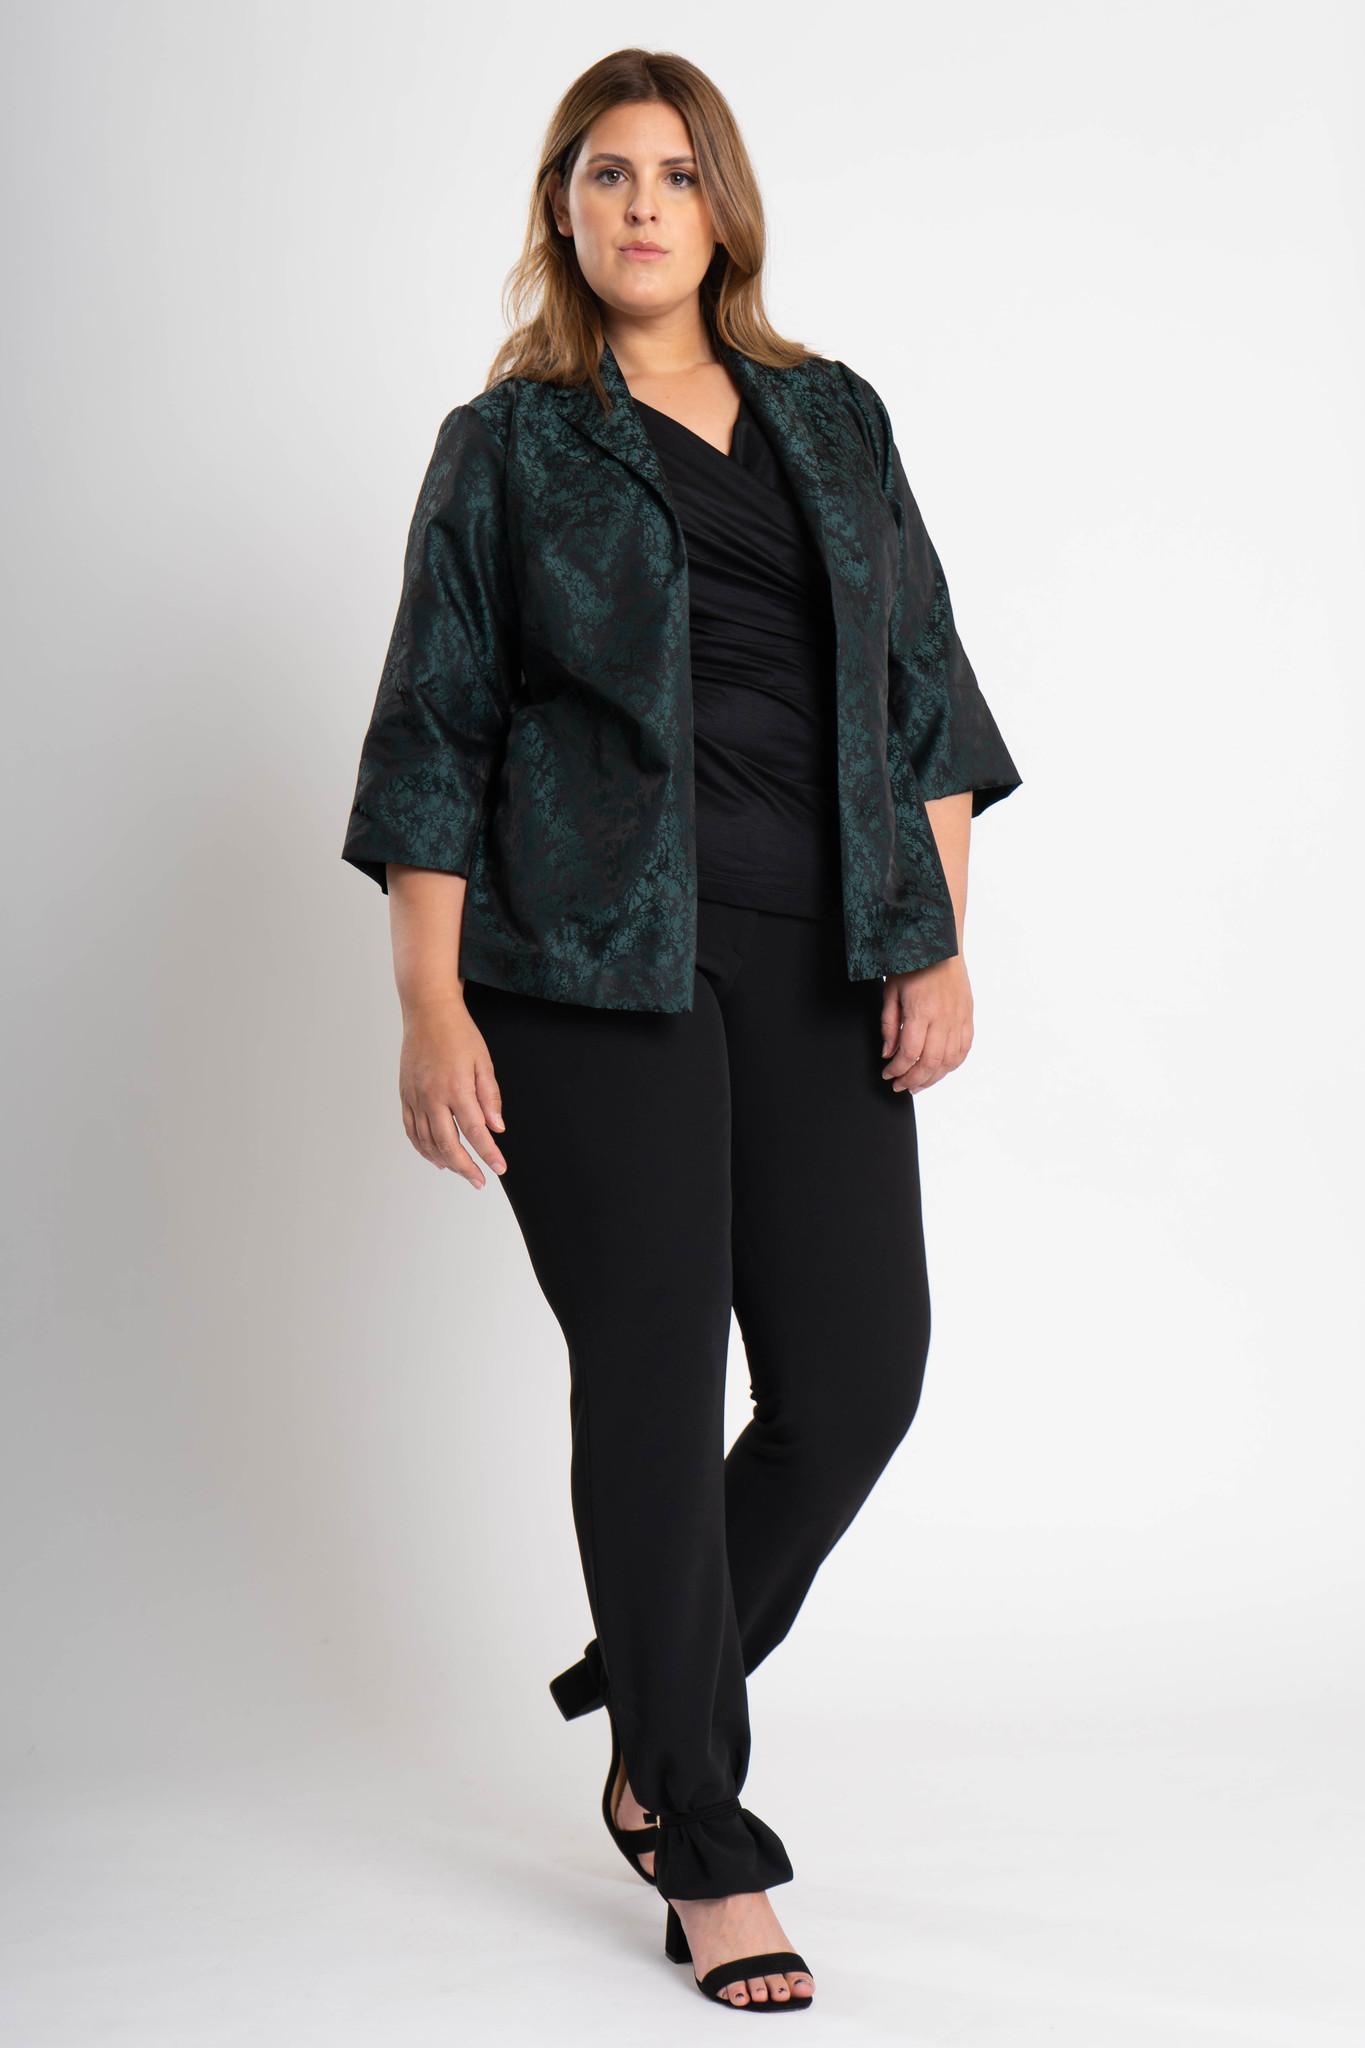 HISA Jacke aus Polyester Jacquard-2